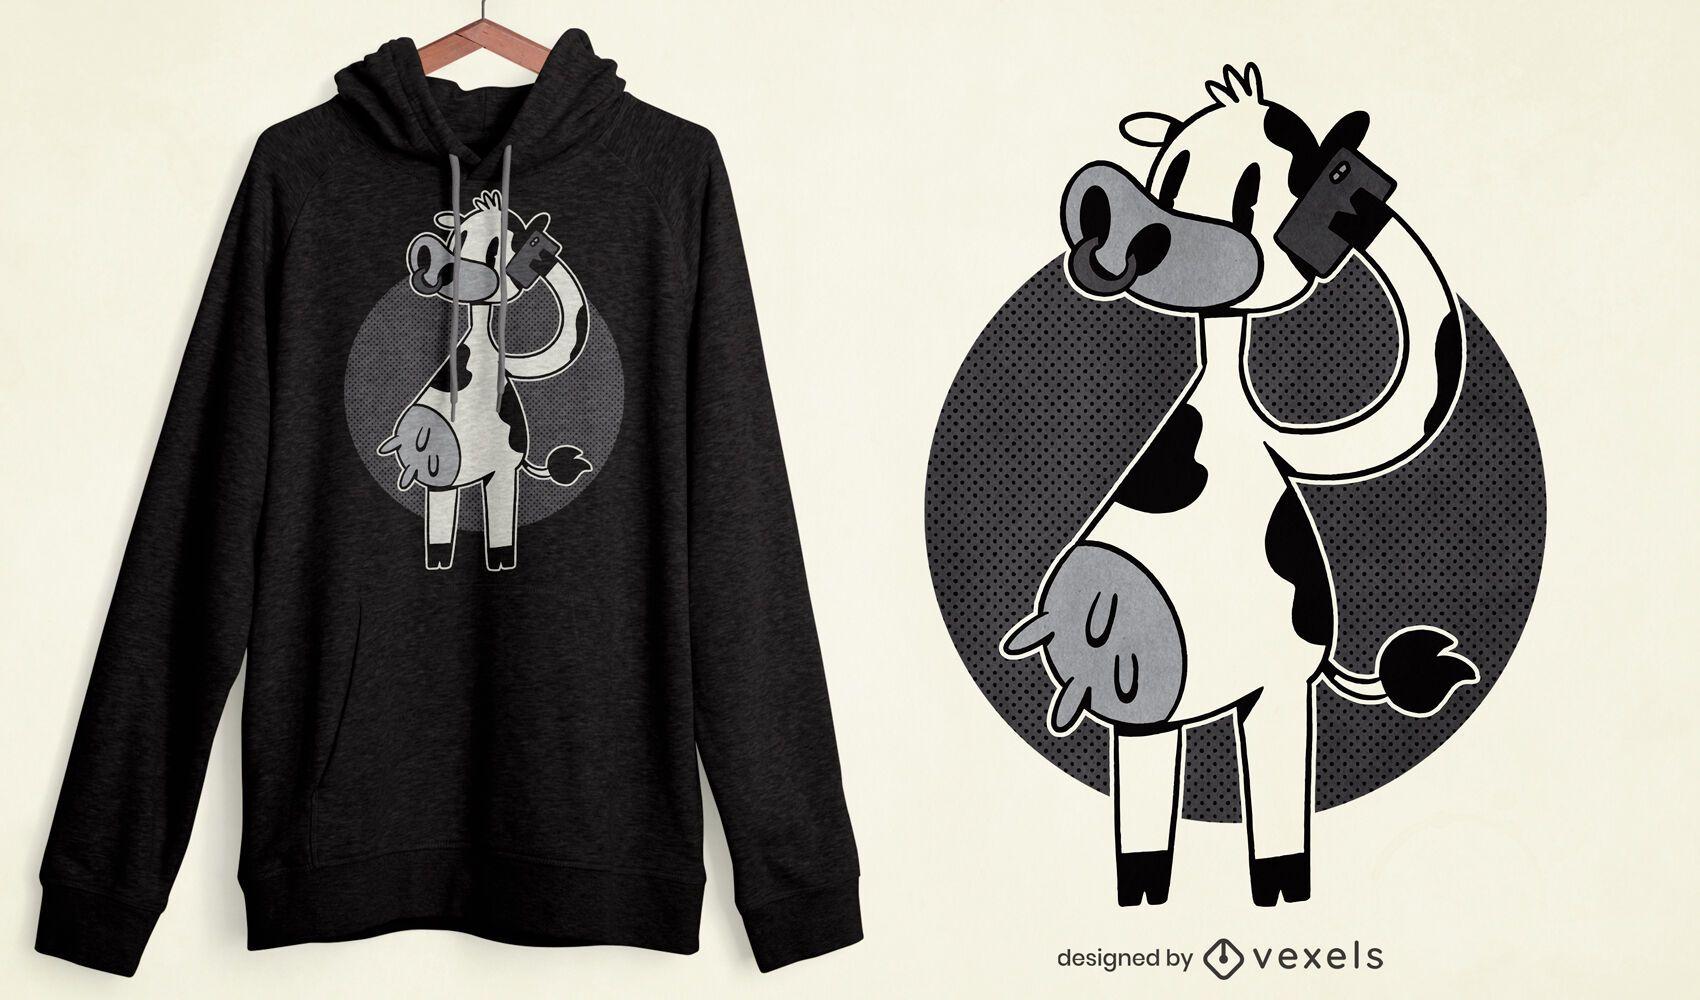 Cow phone call t-shirt design